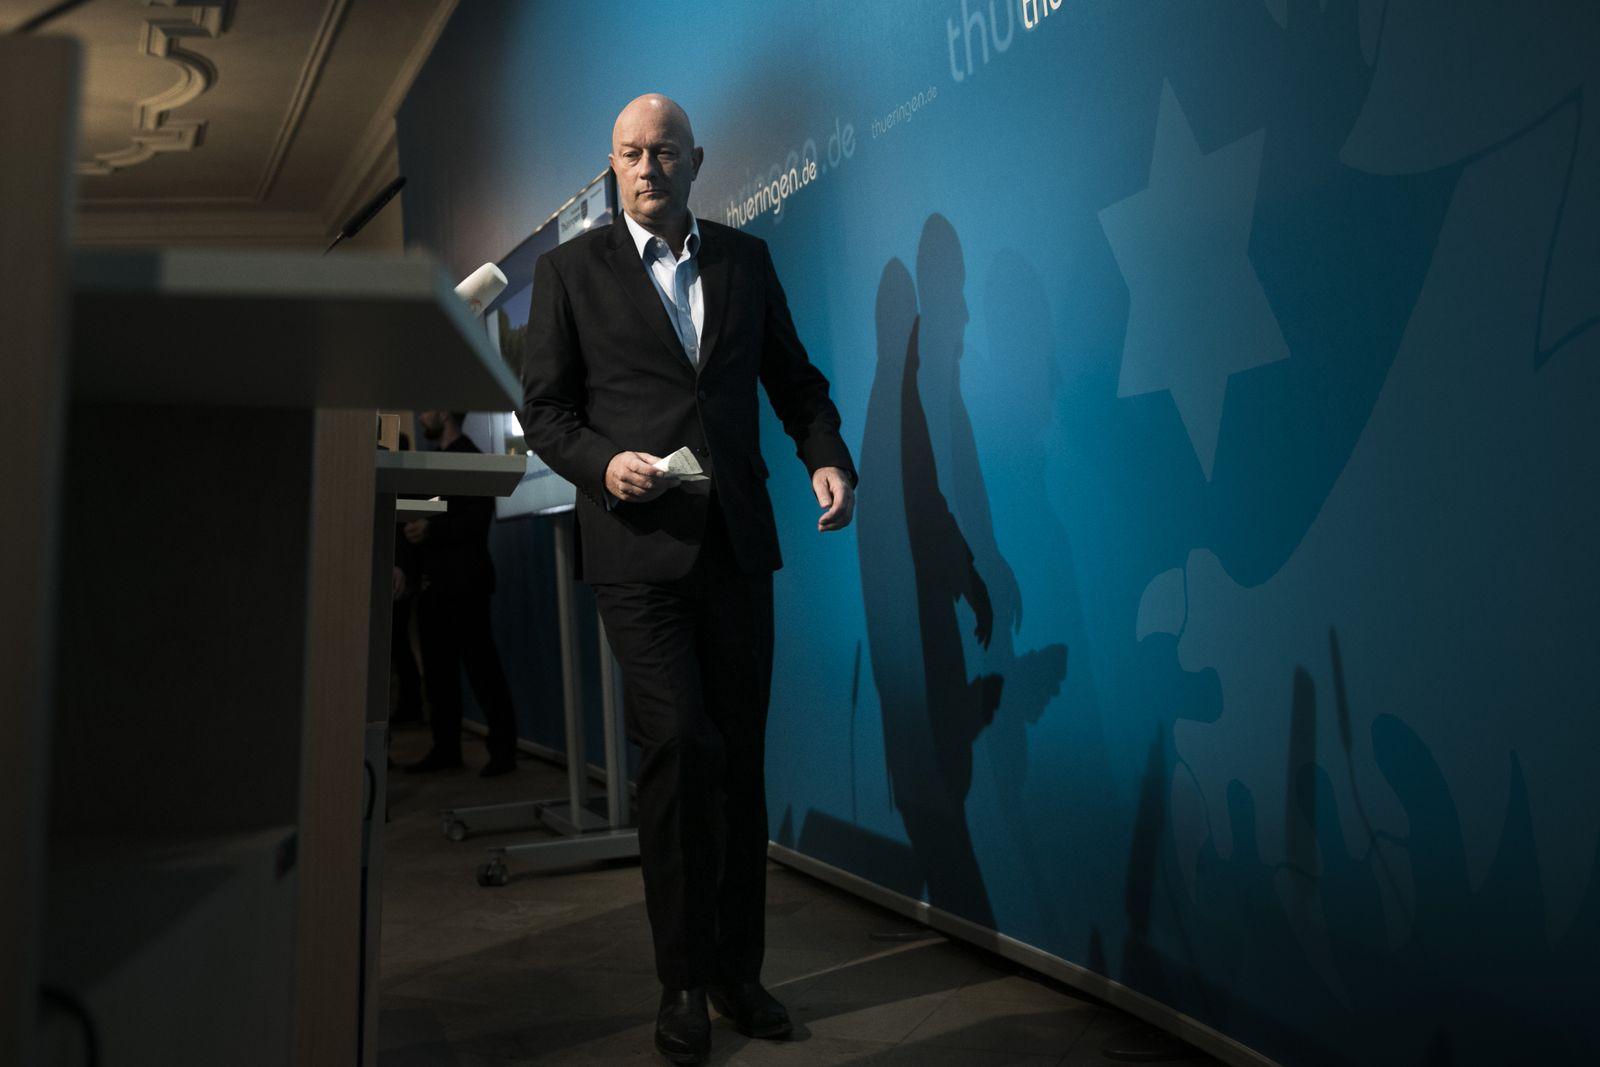 Thuringia Governor Election Causes Political Storm